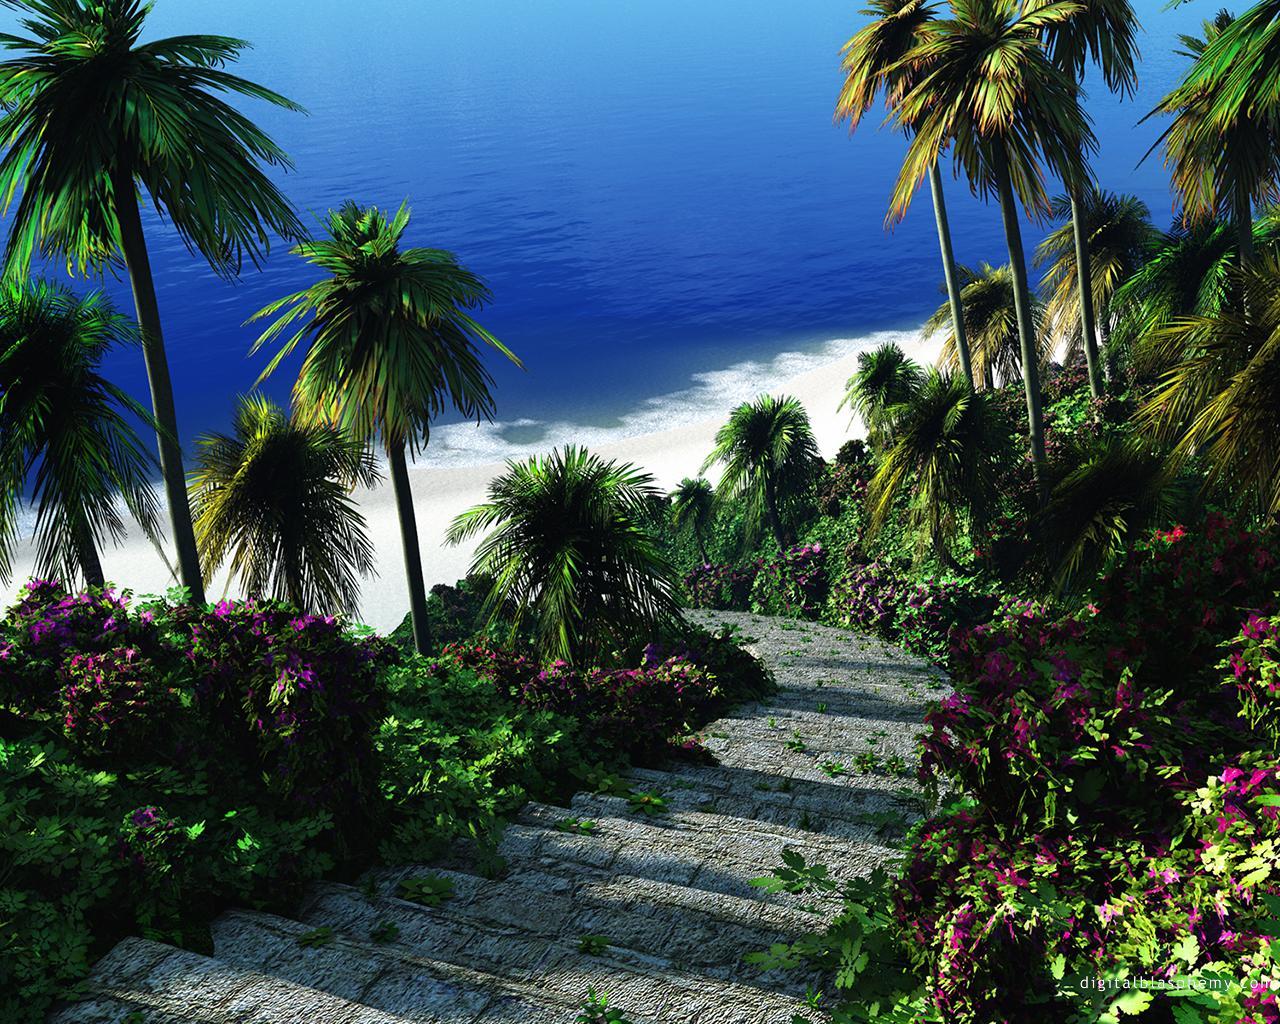 Nature 3d Wallpaper Hd For Desktop Free Download - Digital Blasphemy Free Beach - HD Wallpaper